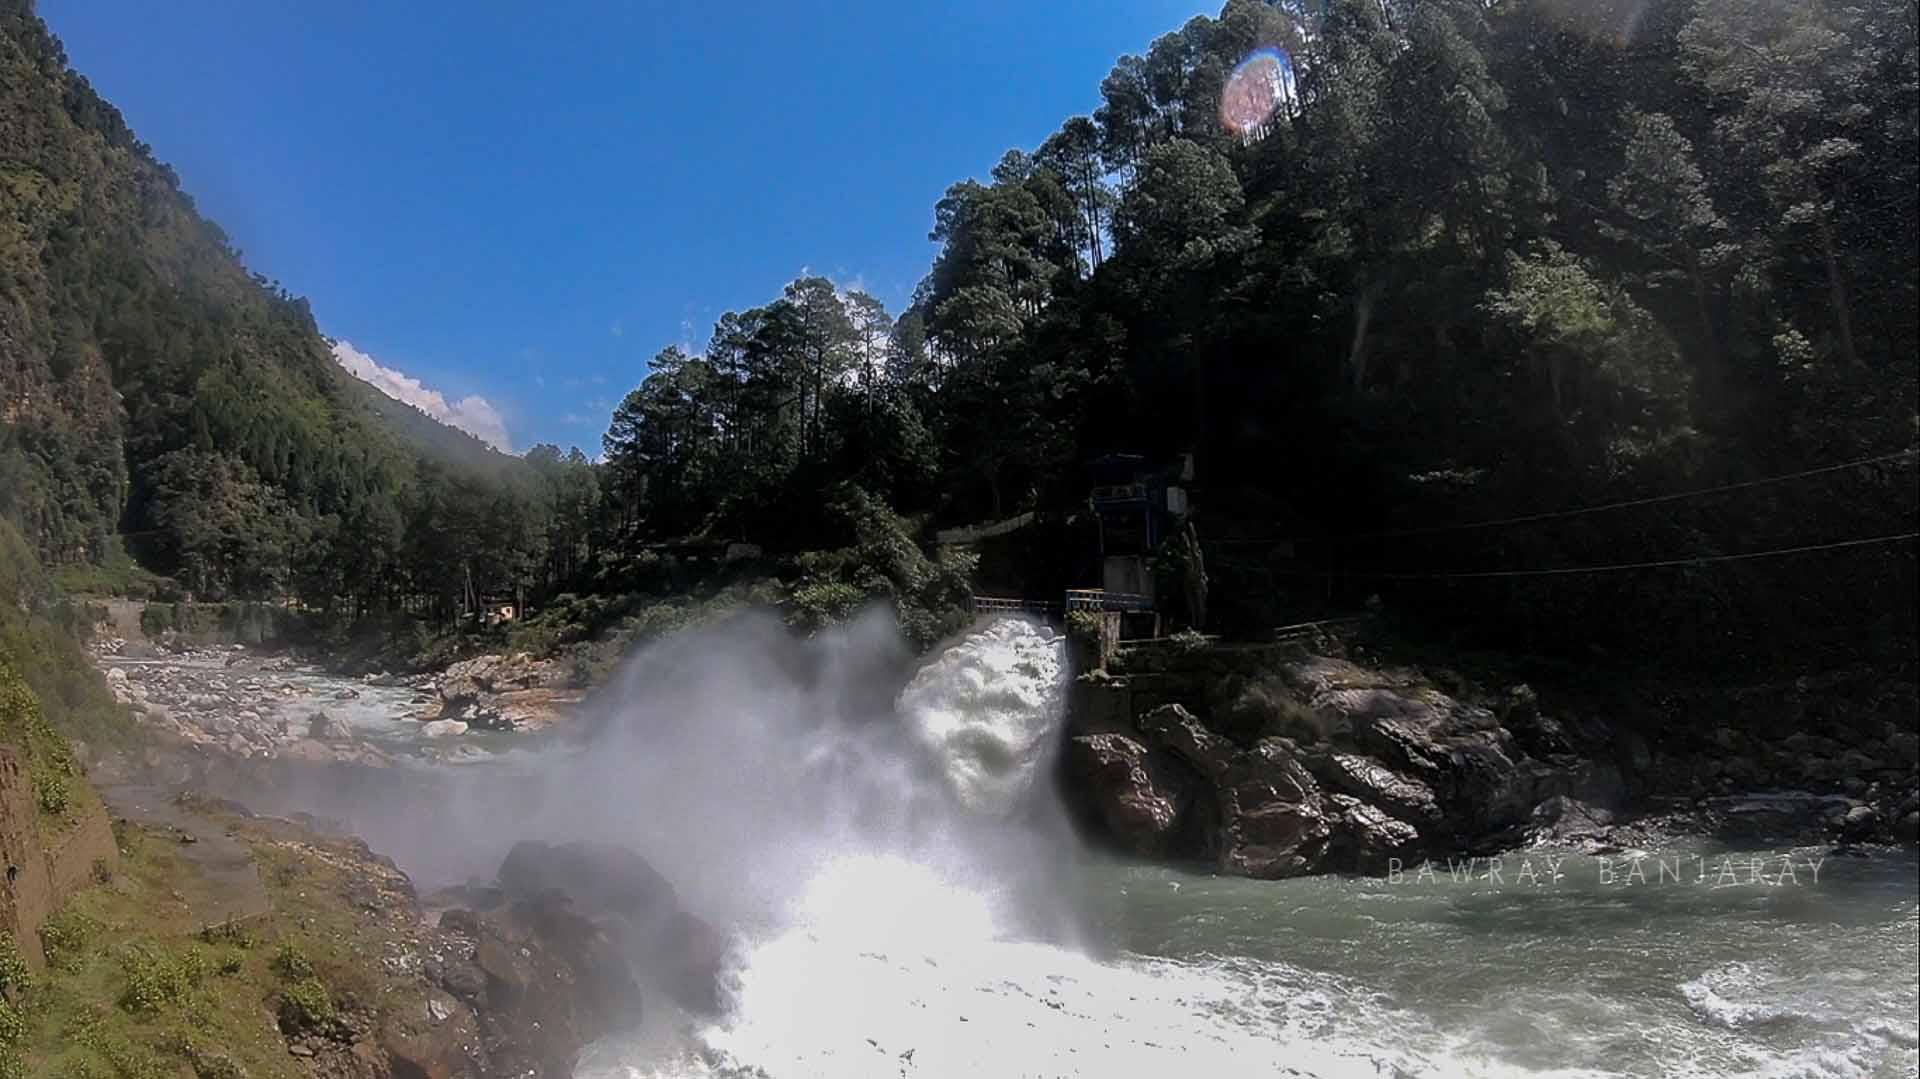 hydro power project near harshil